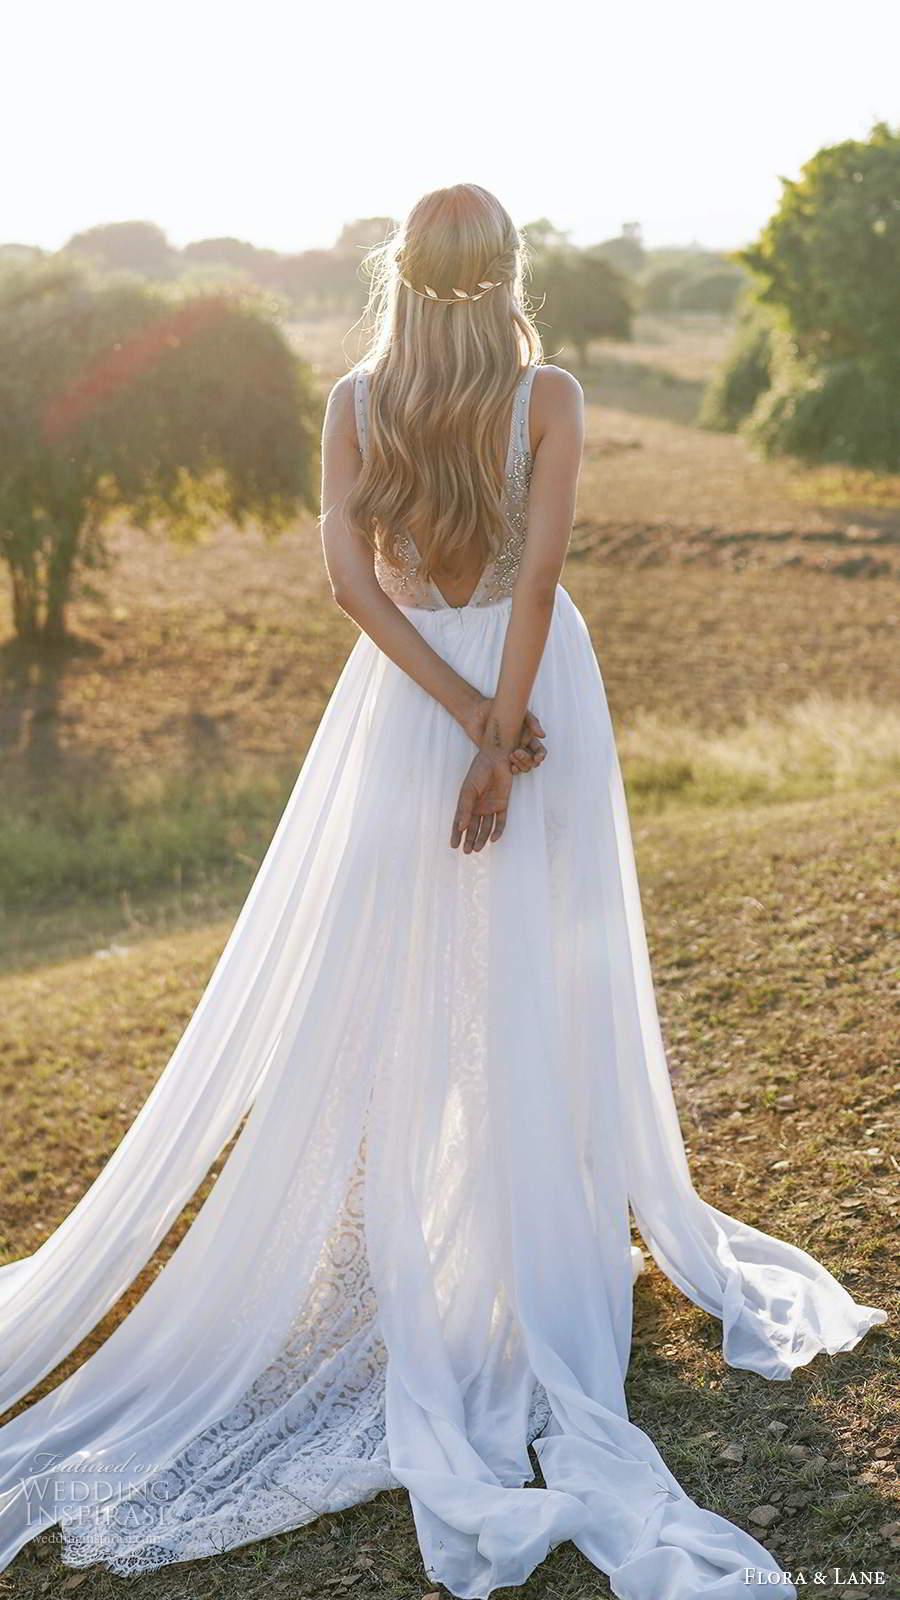 flora and lane 2019 bridal sleevelss straps v neckline heavily embellished bodice a line ball gown wedding dress v back chapel train (7) bv